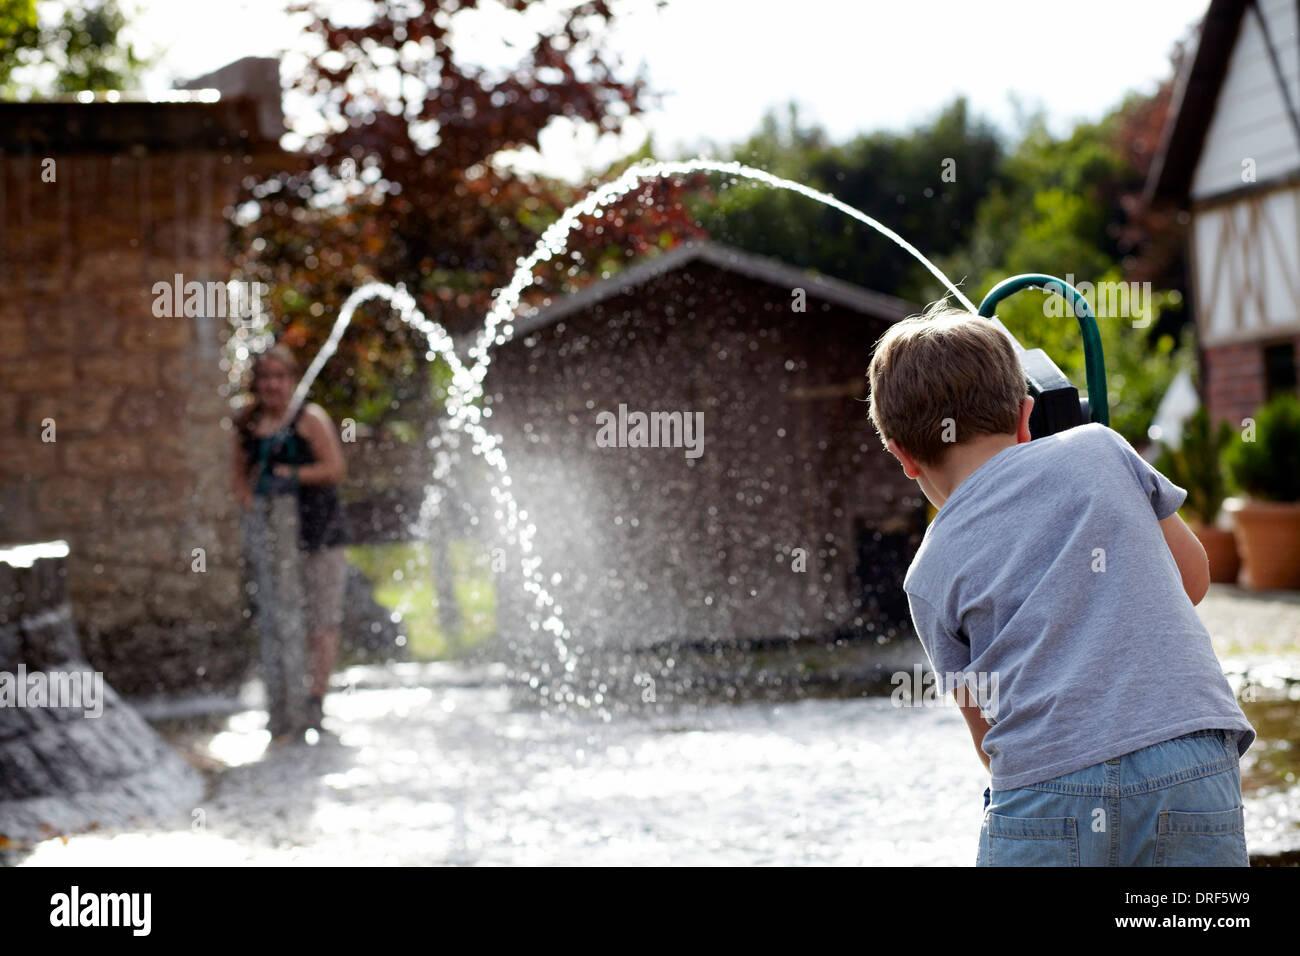 Two Boys Playing With Water, Bad Woerrishofen, Bavaria, Germany, Europe - Stock Image